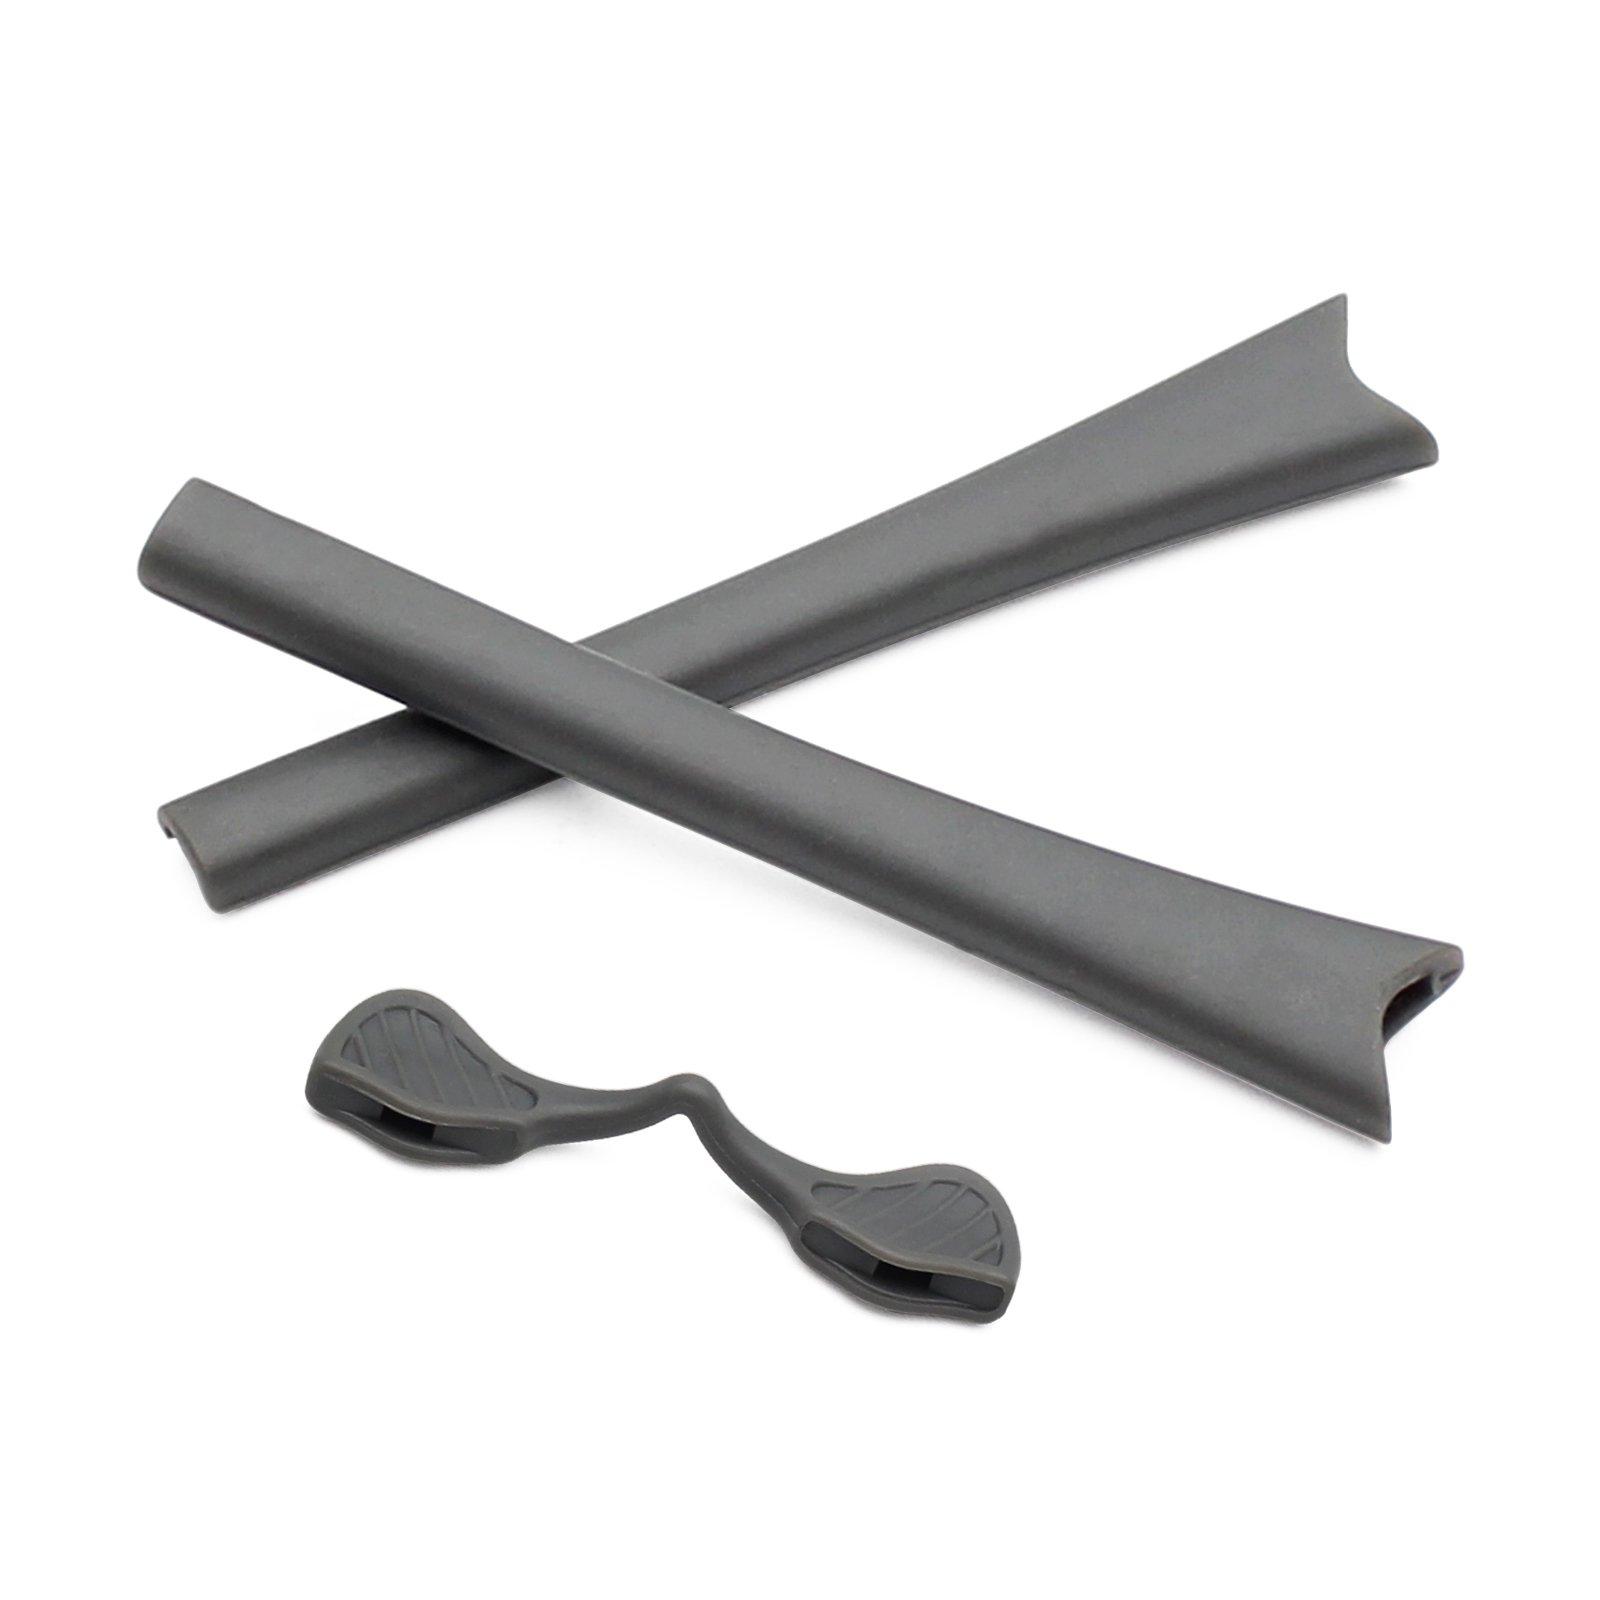 Mryok Replacement Earsocks Nosepieces Kits for Oakley Radar Path Sunglass - Opt